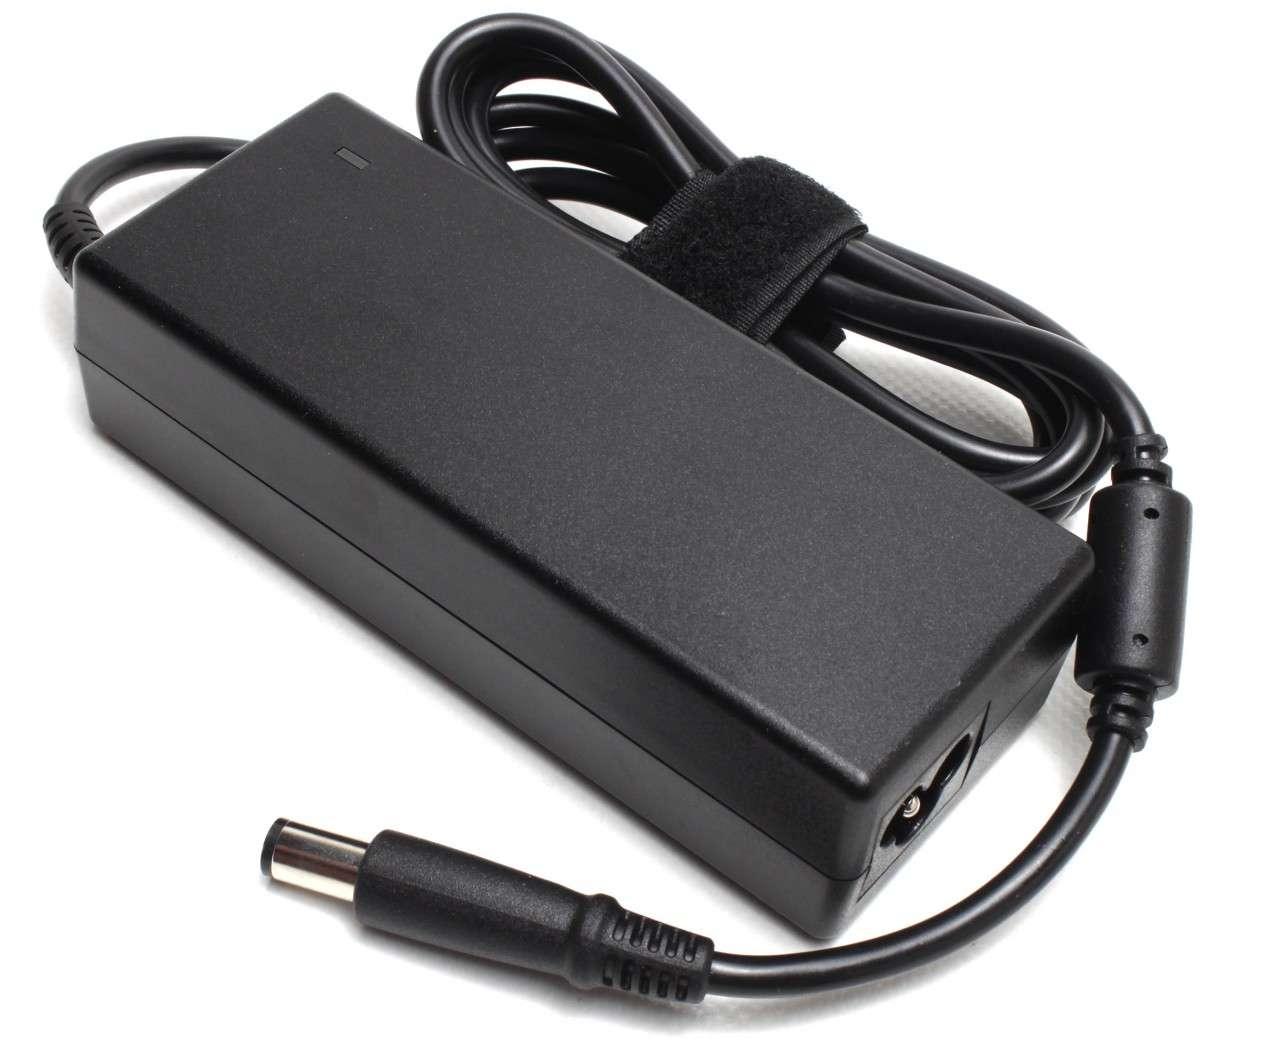 Incarcator Dell Latitude E7440 VARIANTA 3 imagine powerlaptop.ro 2021